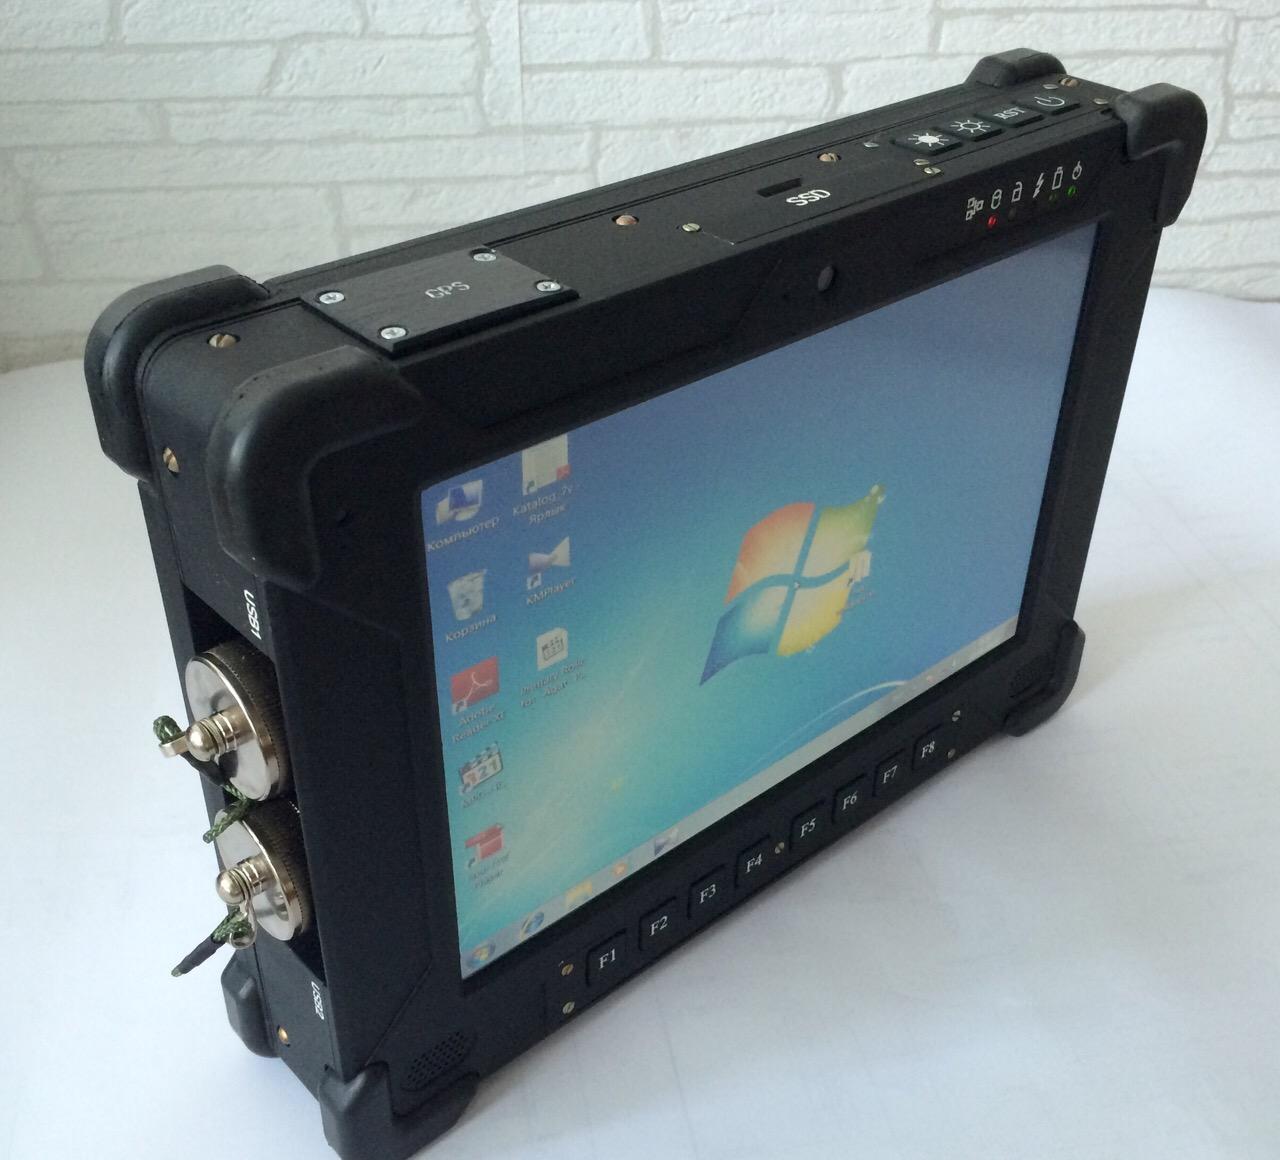 Danaks Uab Rugged 10 1 Military Grade Tablet